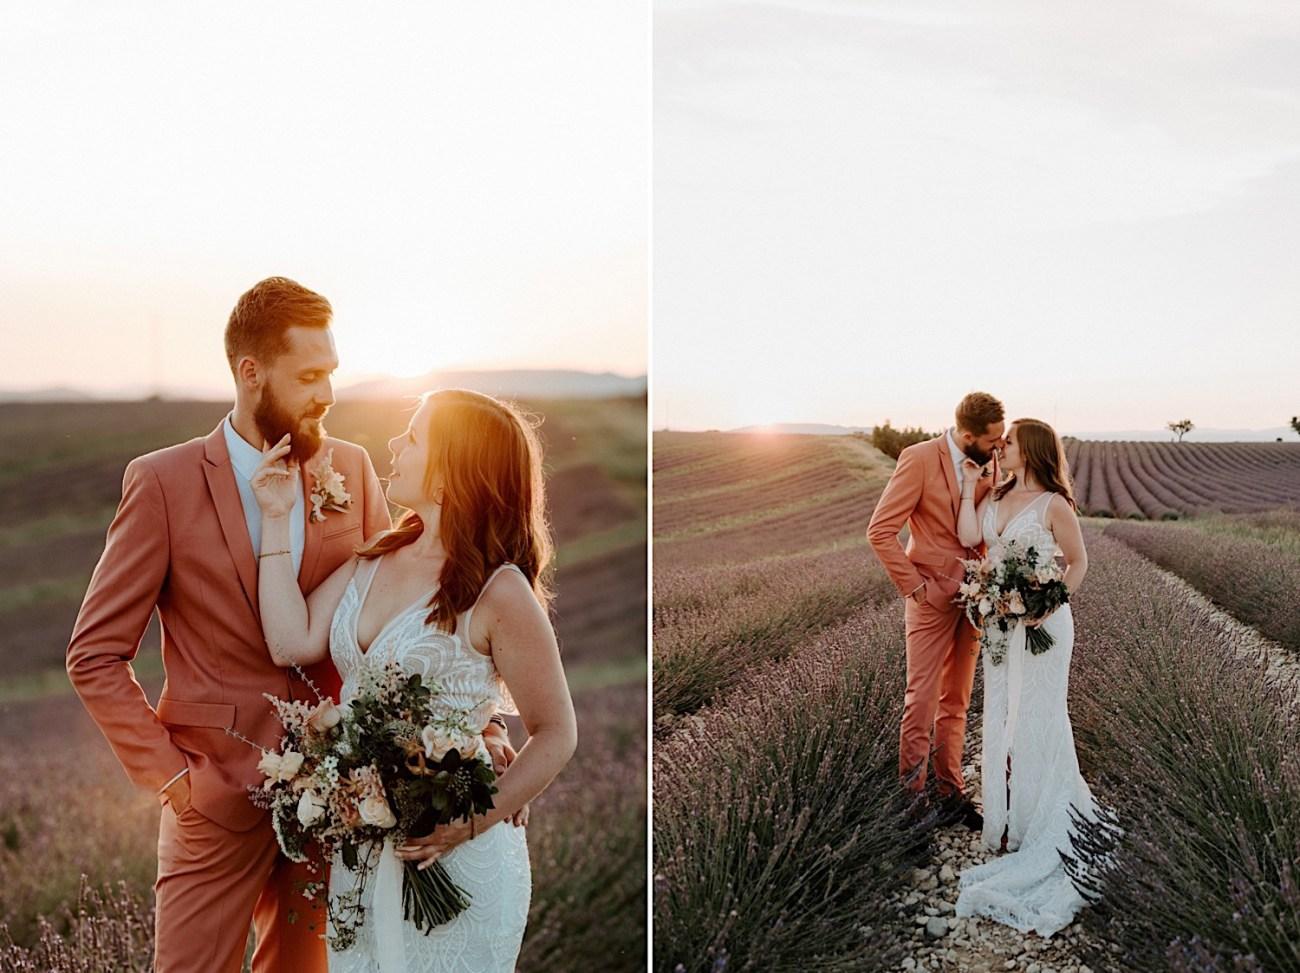 Valensole Wedding Photos Lavender Field Wedding Provence Wedding French Wedding Photographer Destination Wedding France Anais Possamai Photography 02